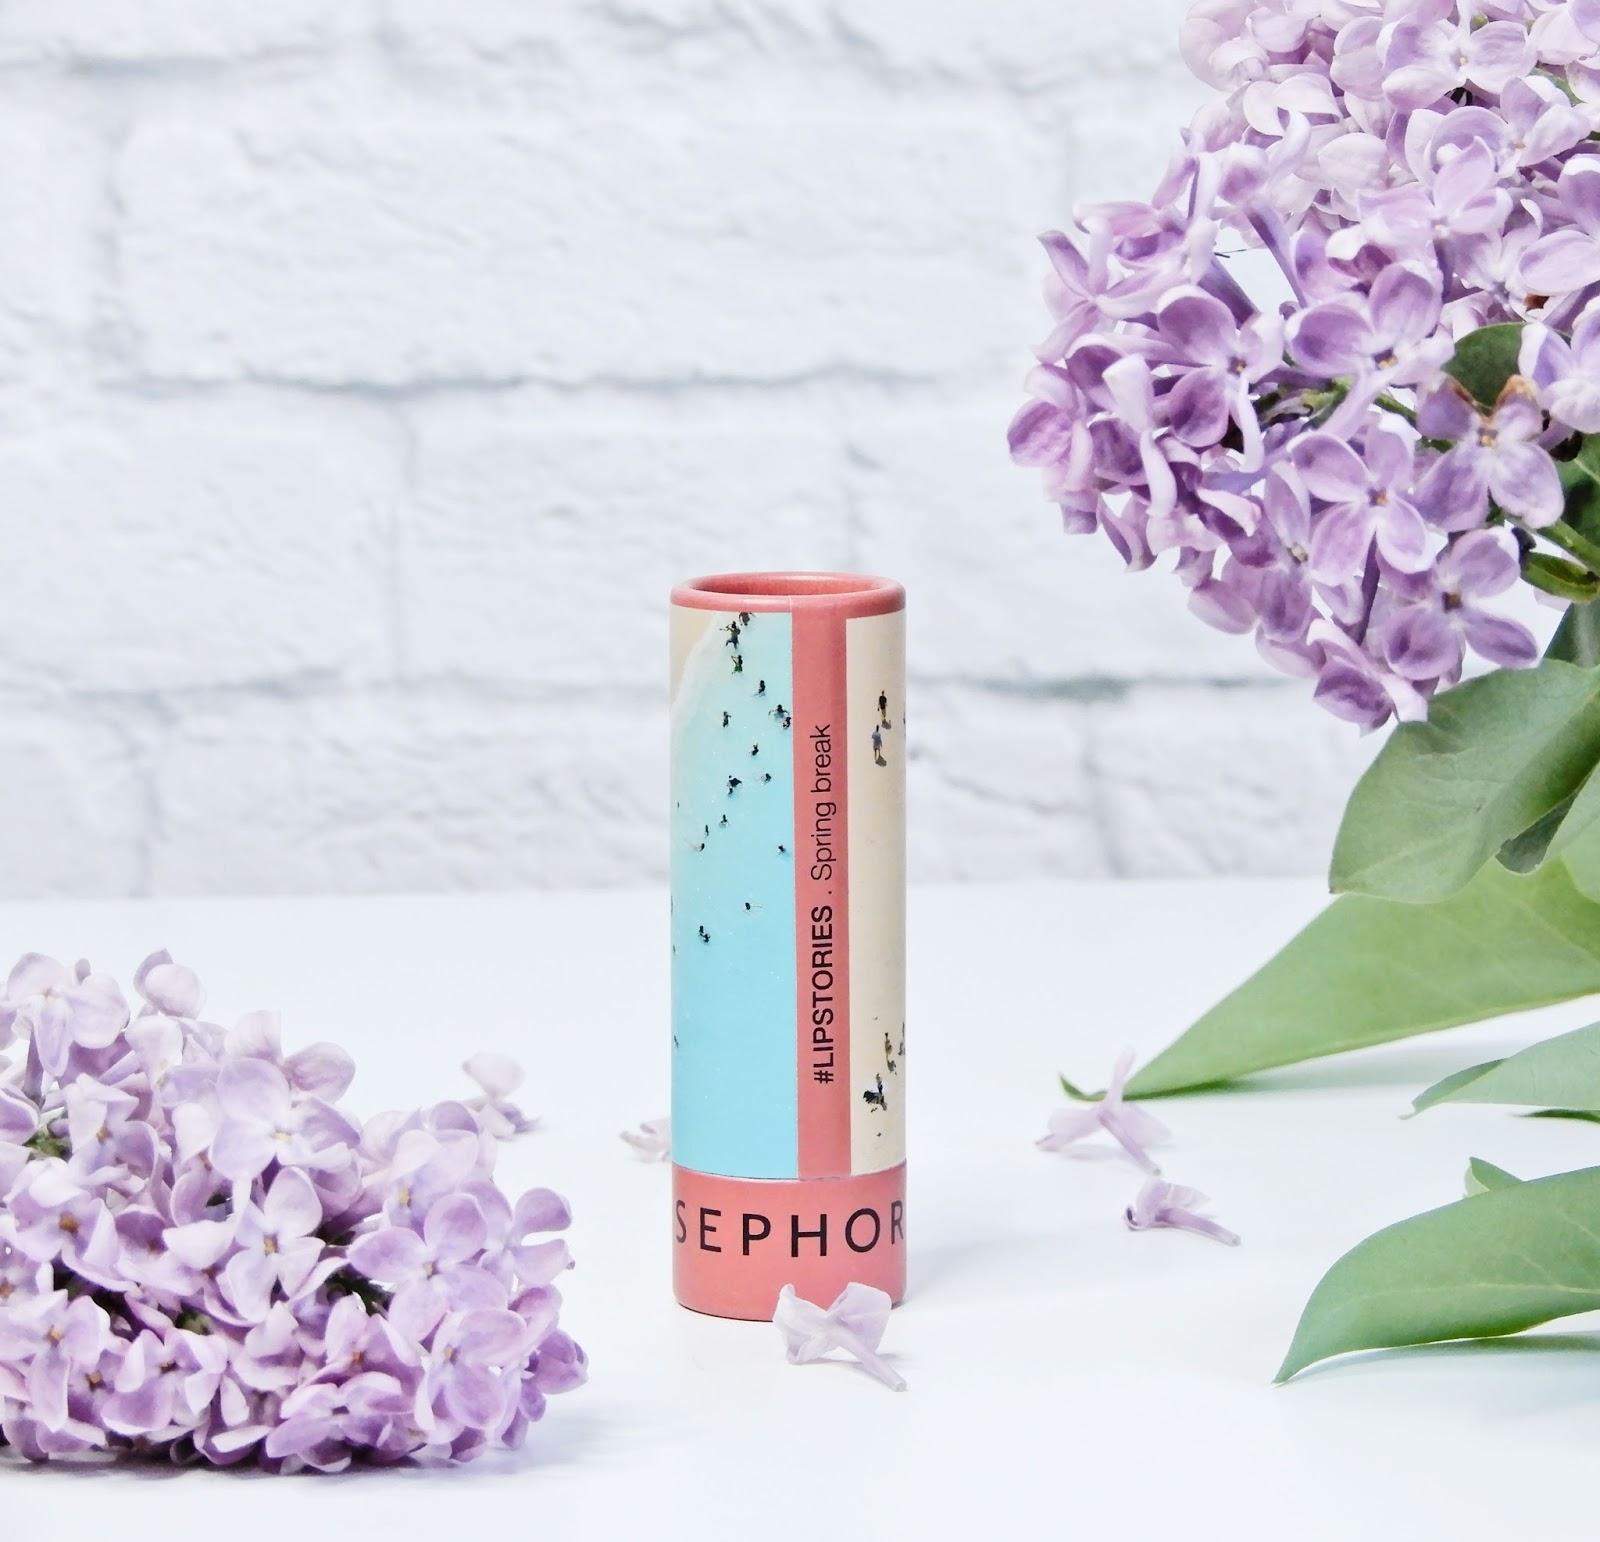 pomadka Sephora z serii Lipstories w kolorze 36 - Spring break,